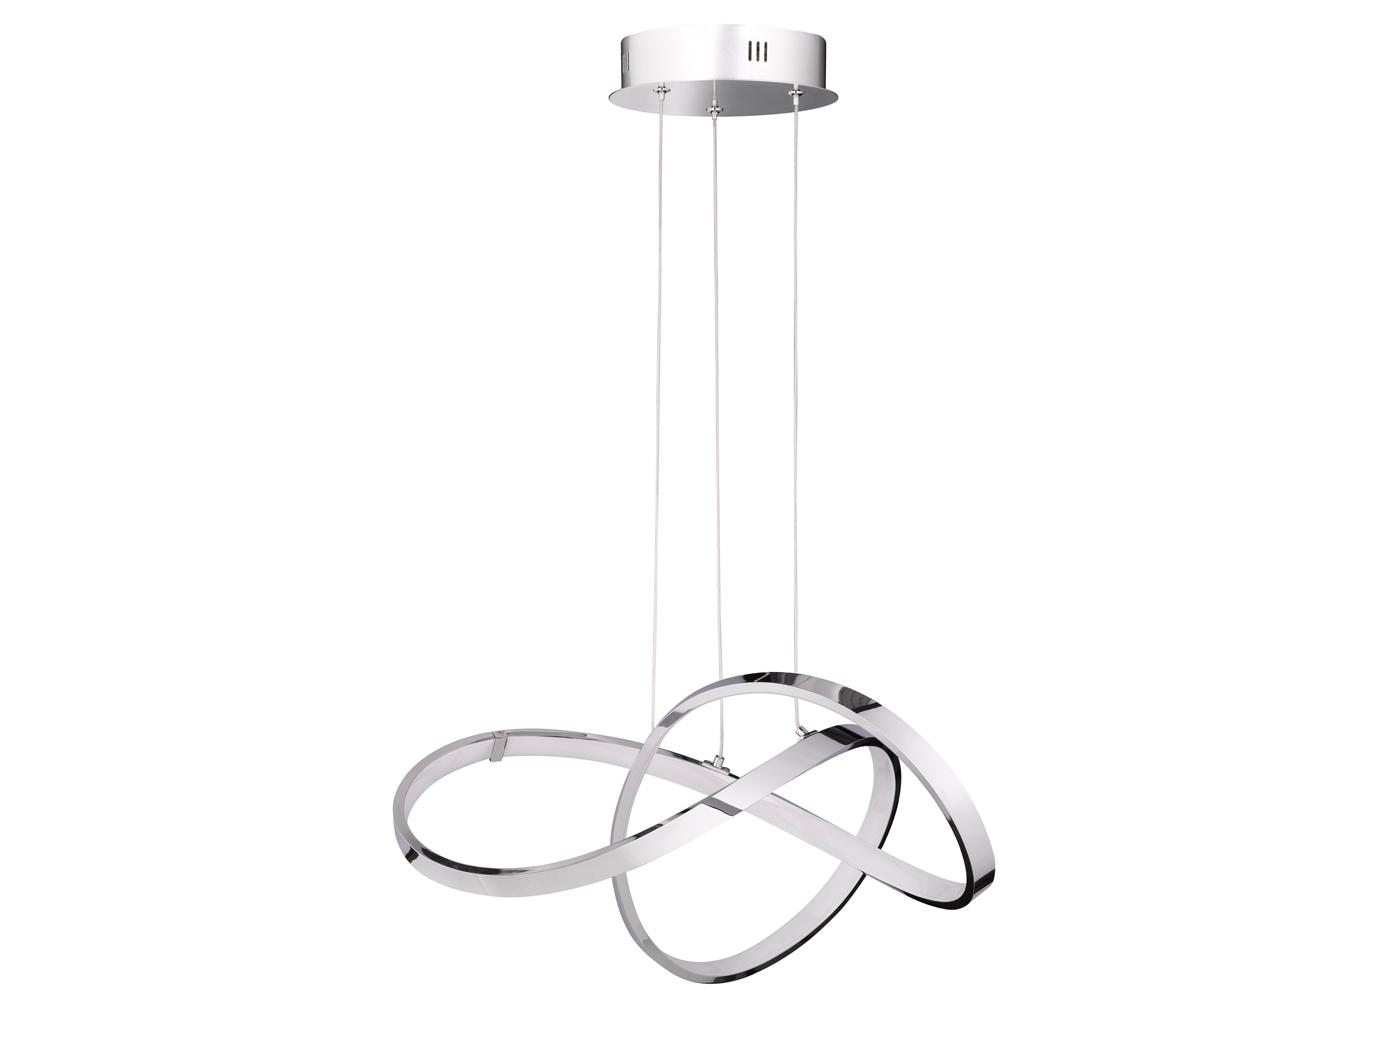 Hohenverstellbare Led Pendelleuchte Dimmbar 27w O 49cm Esstischlampe